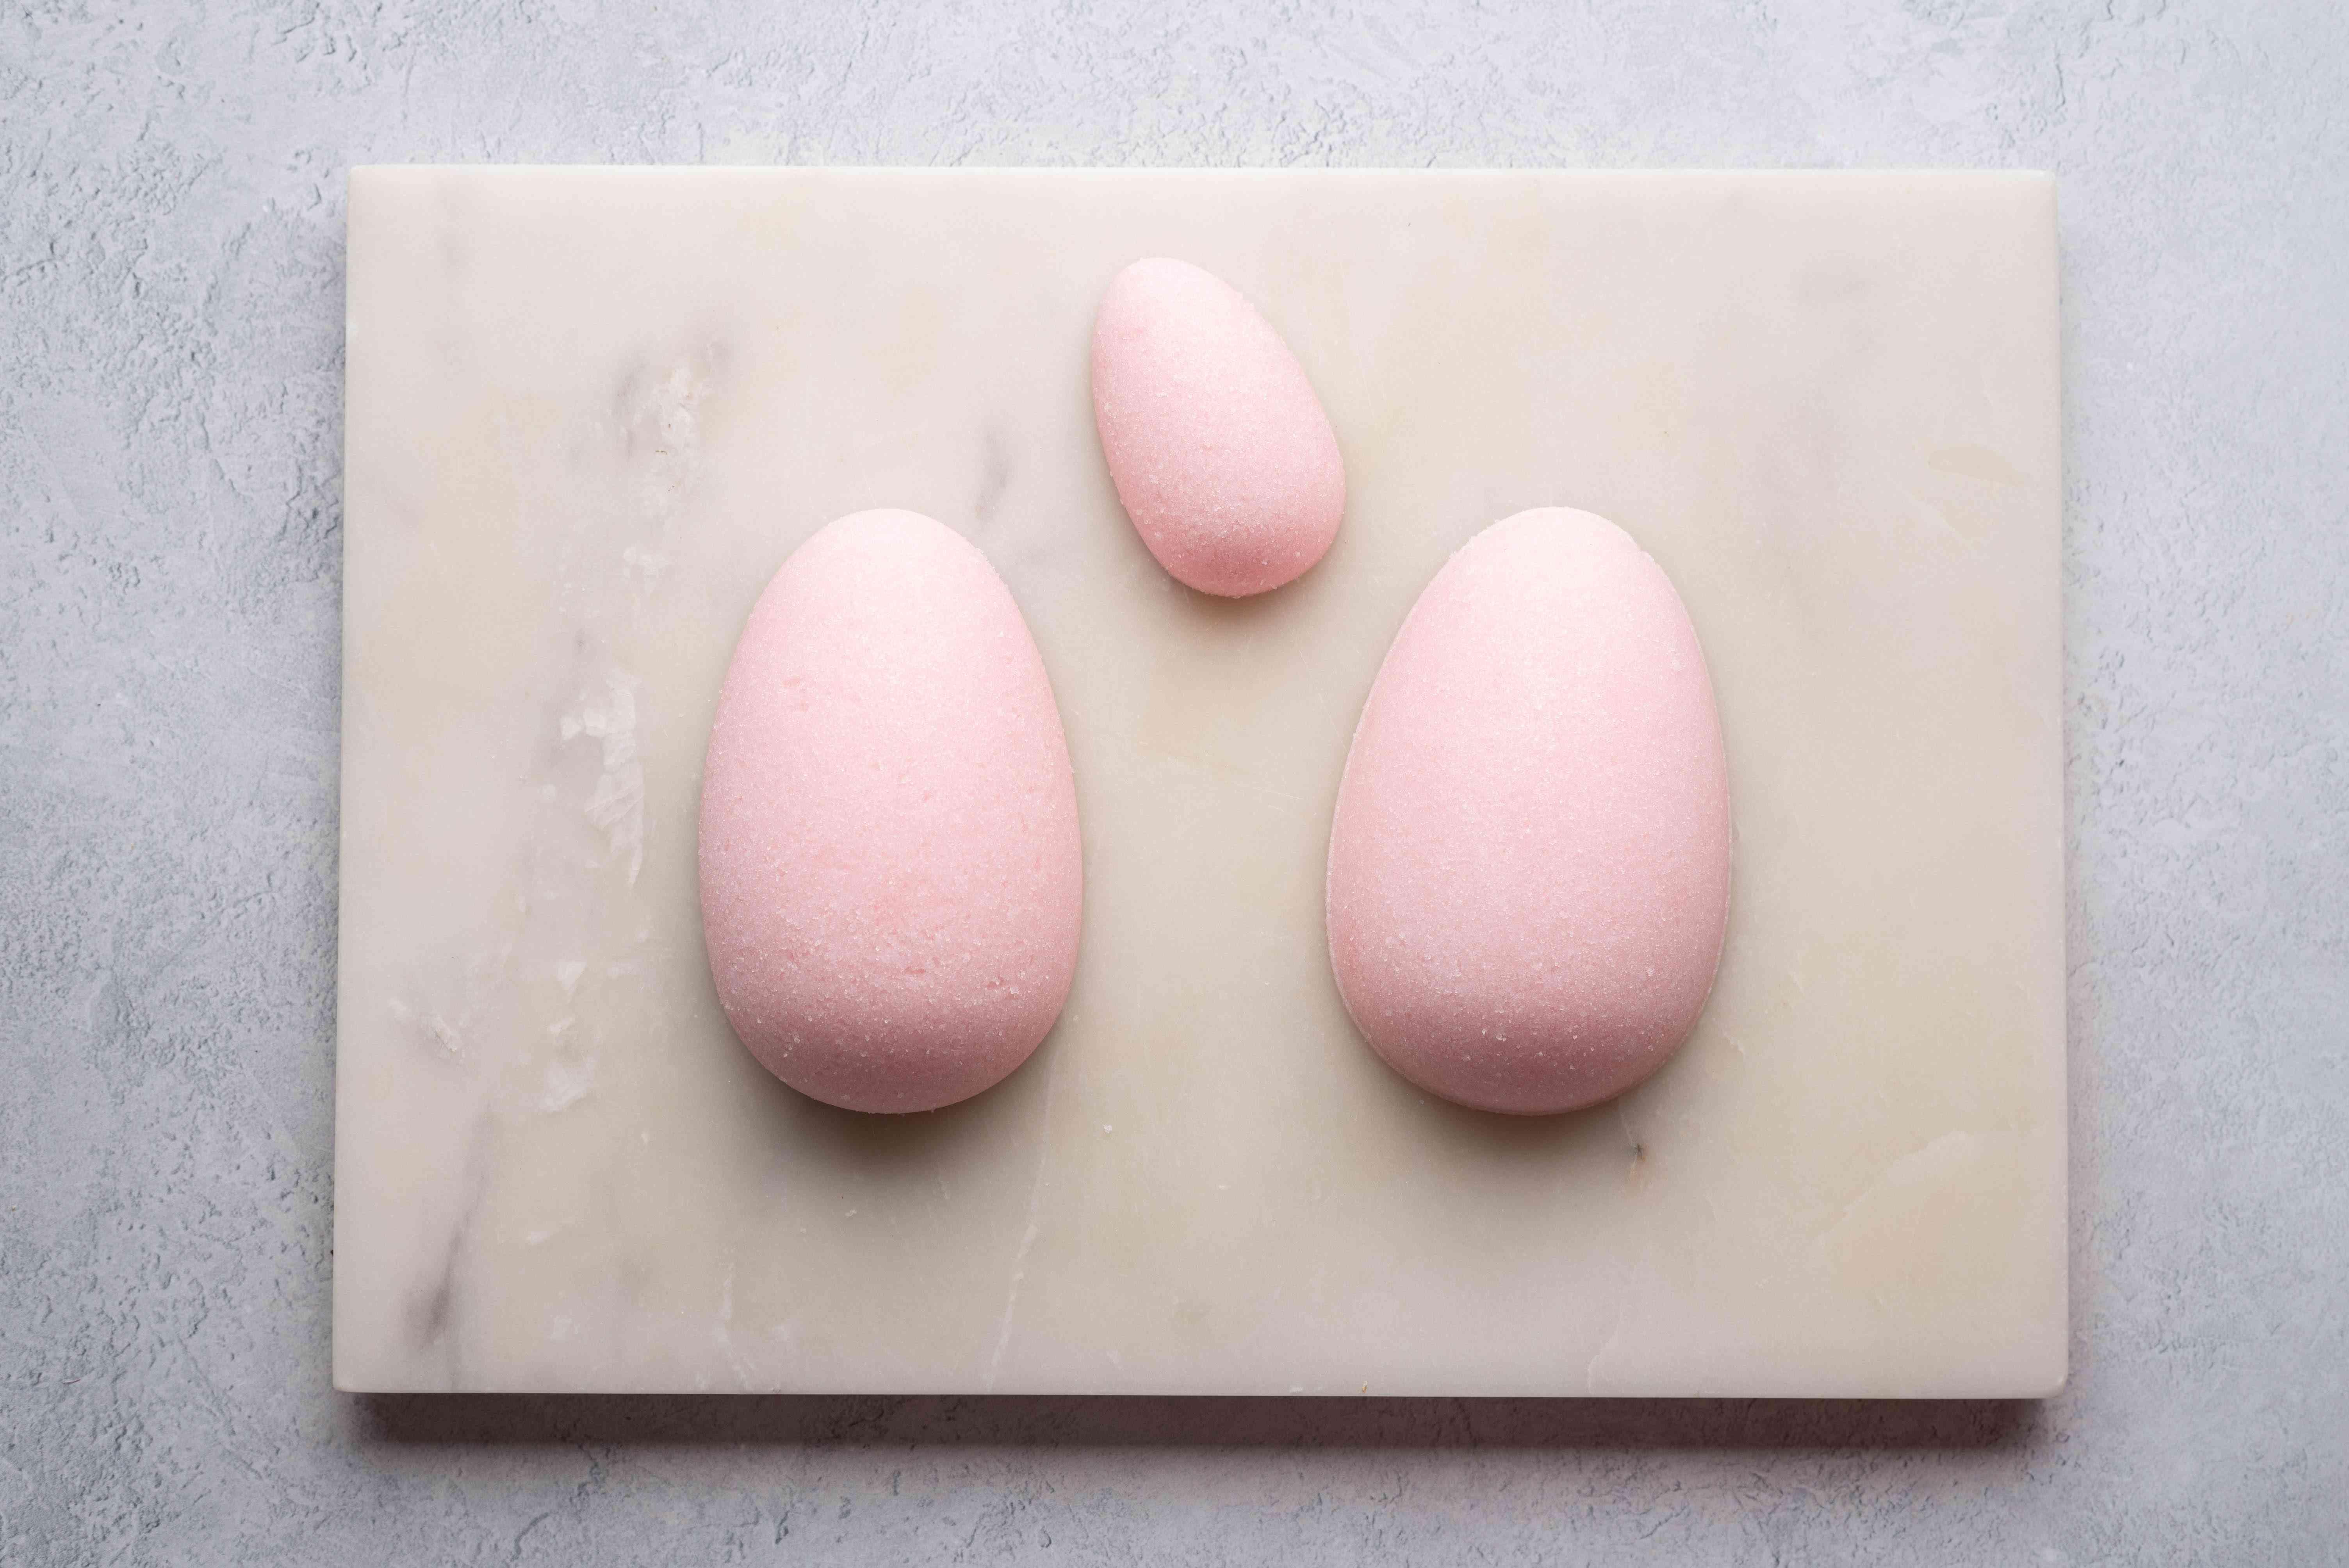 unmolded sugar eggs